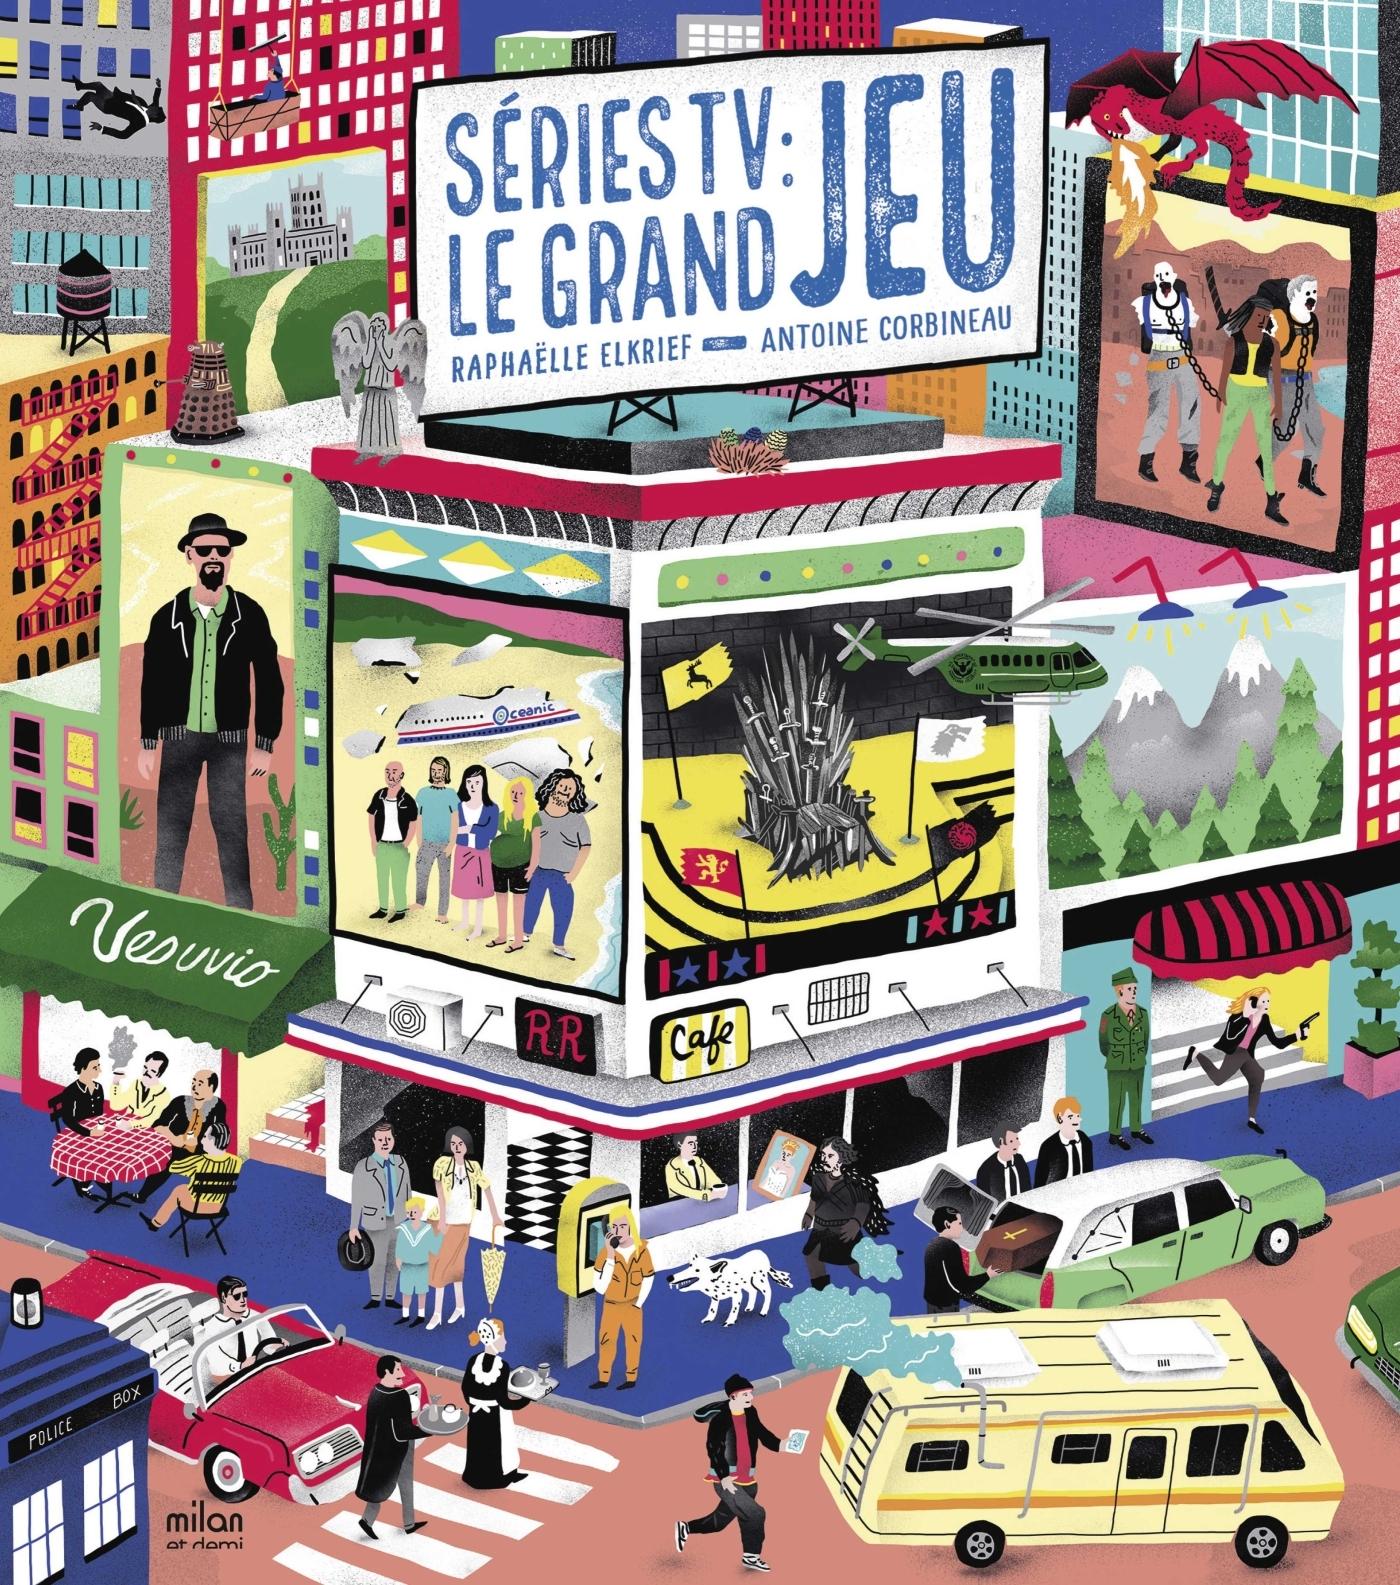 SERIES TV : LE GRAND JEU